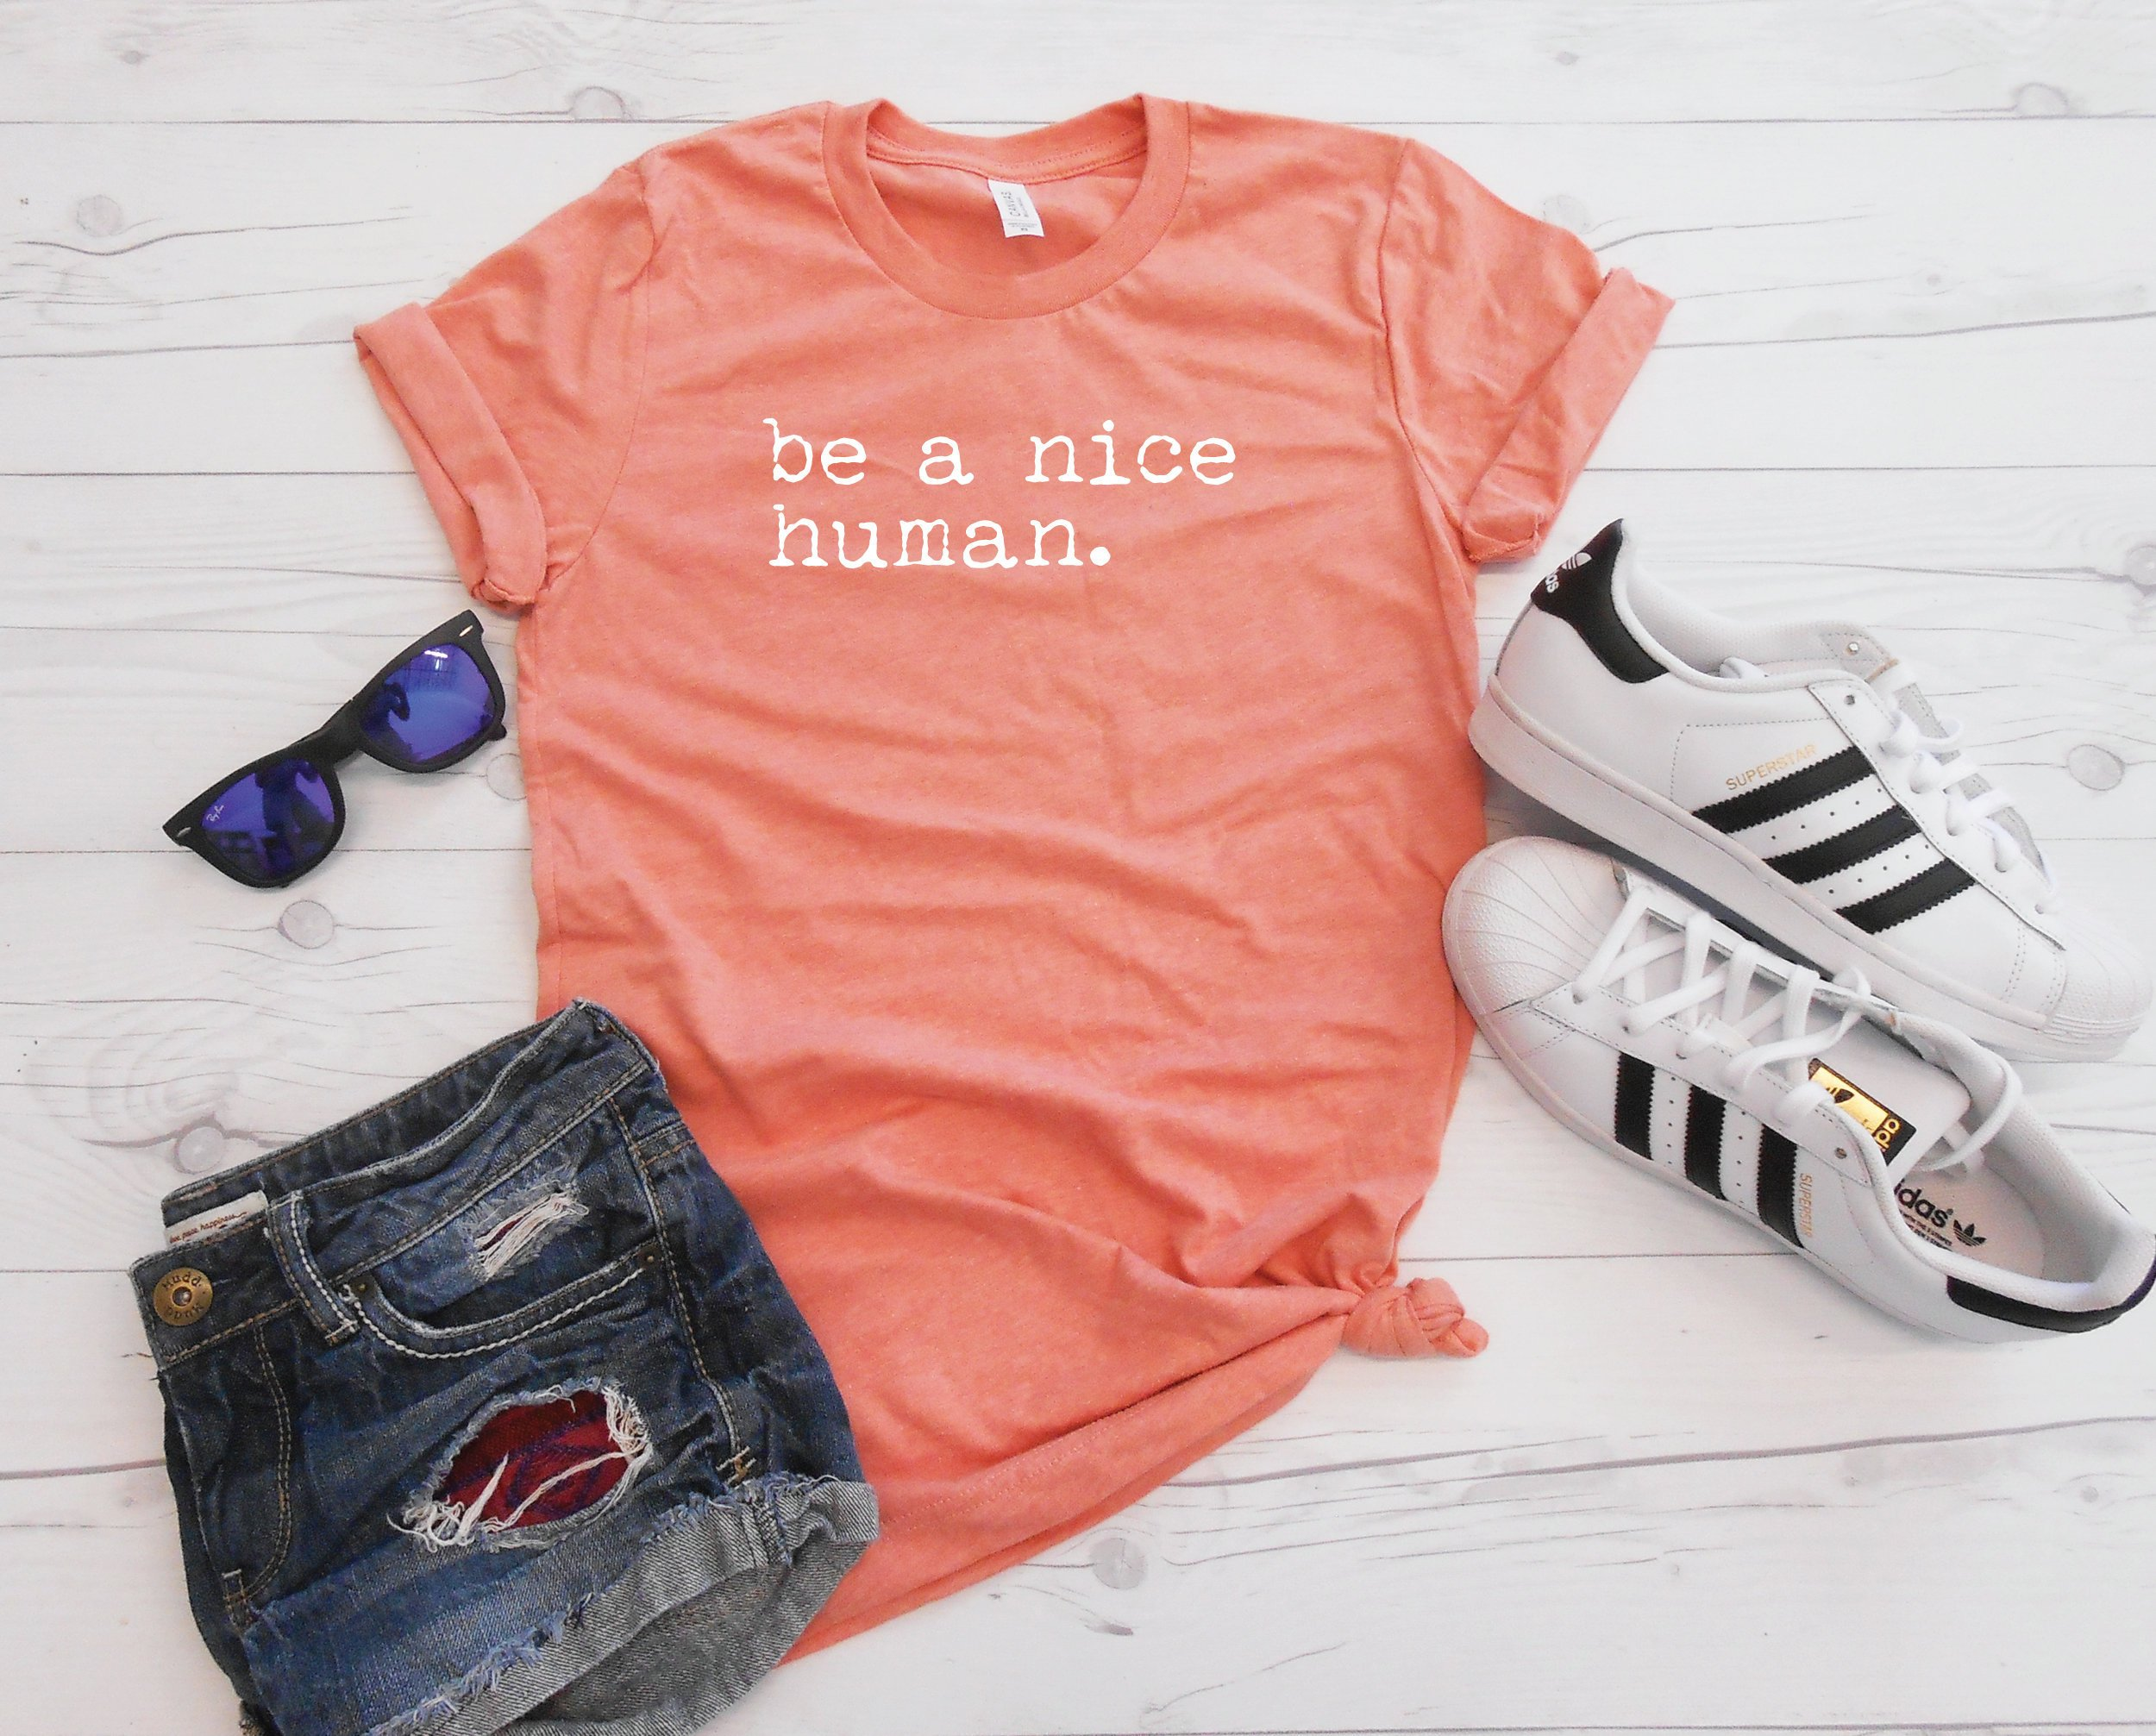 Be A Nice Human T-Shirt, Unisex Tee, Brunch Outfit, Womens Top, Workout Tee,